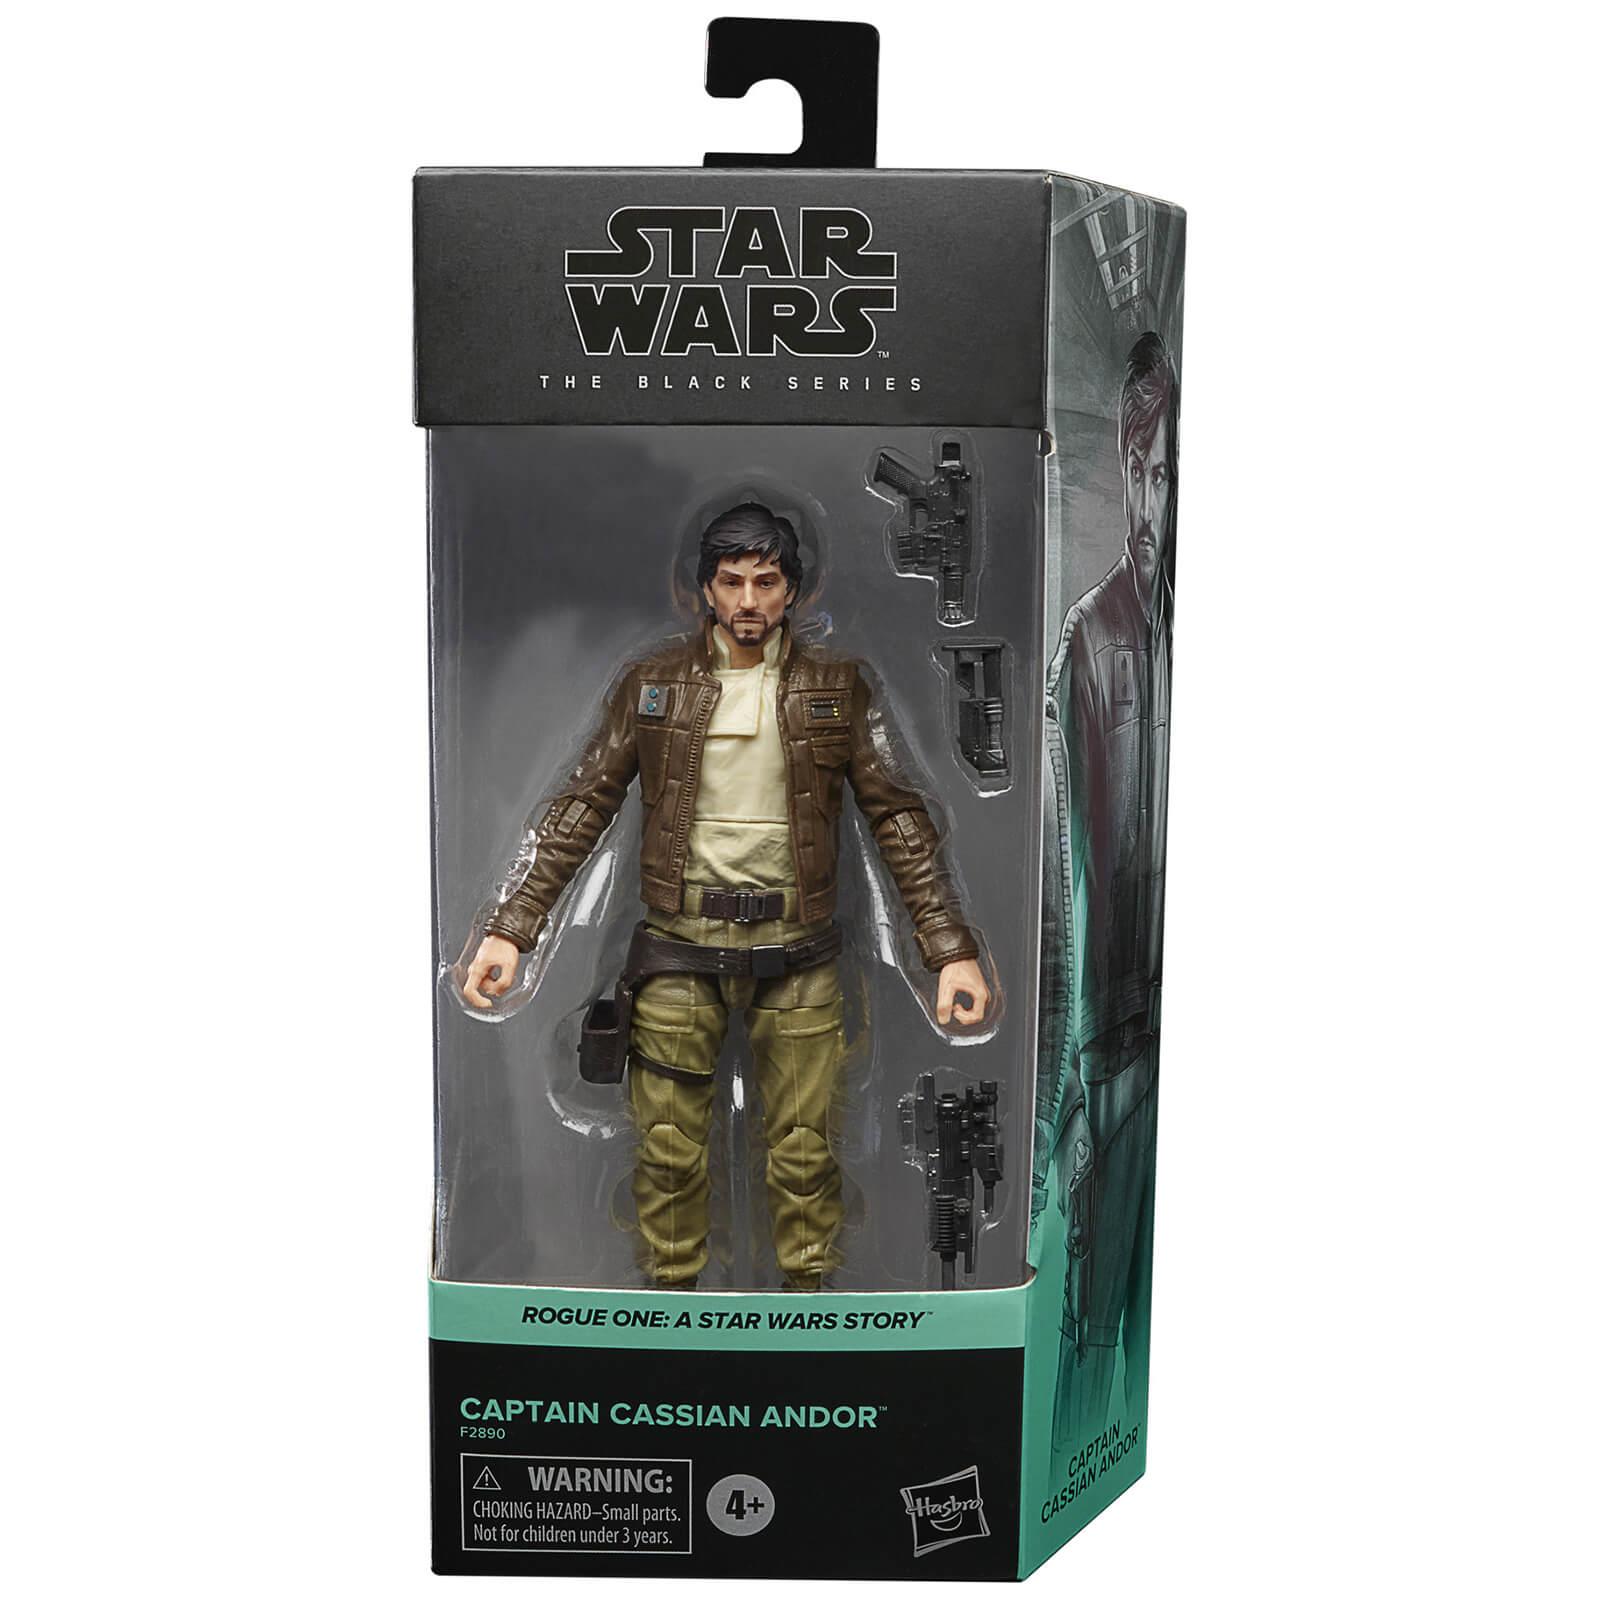 Hasbro Star Wars The Black Series Captain Cassian Andor